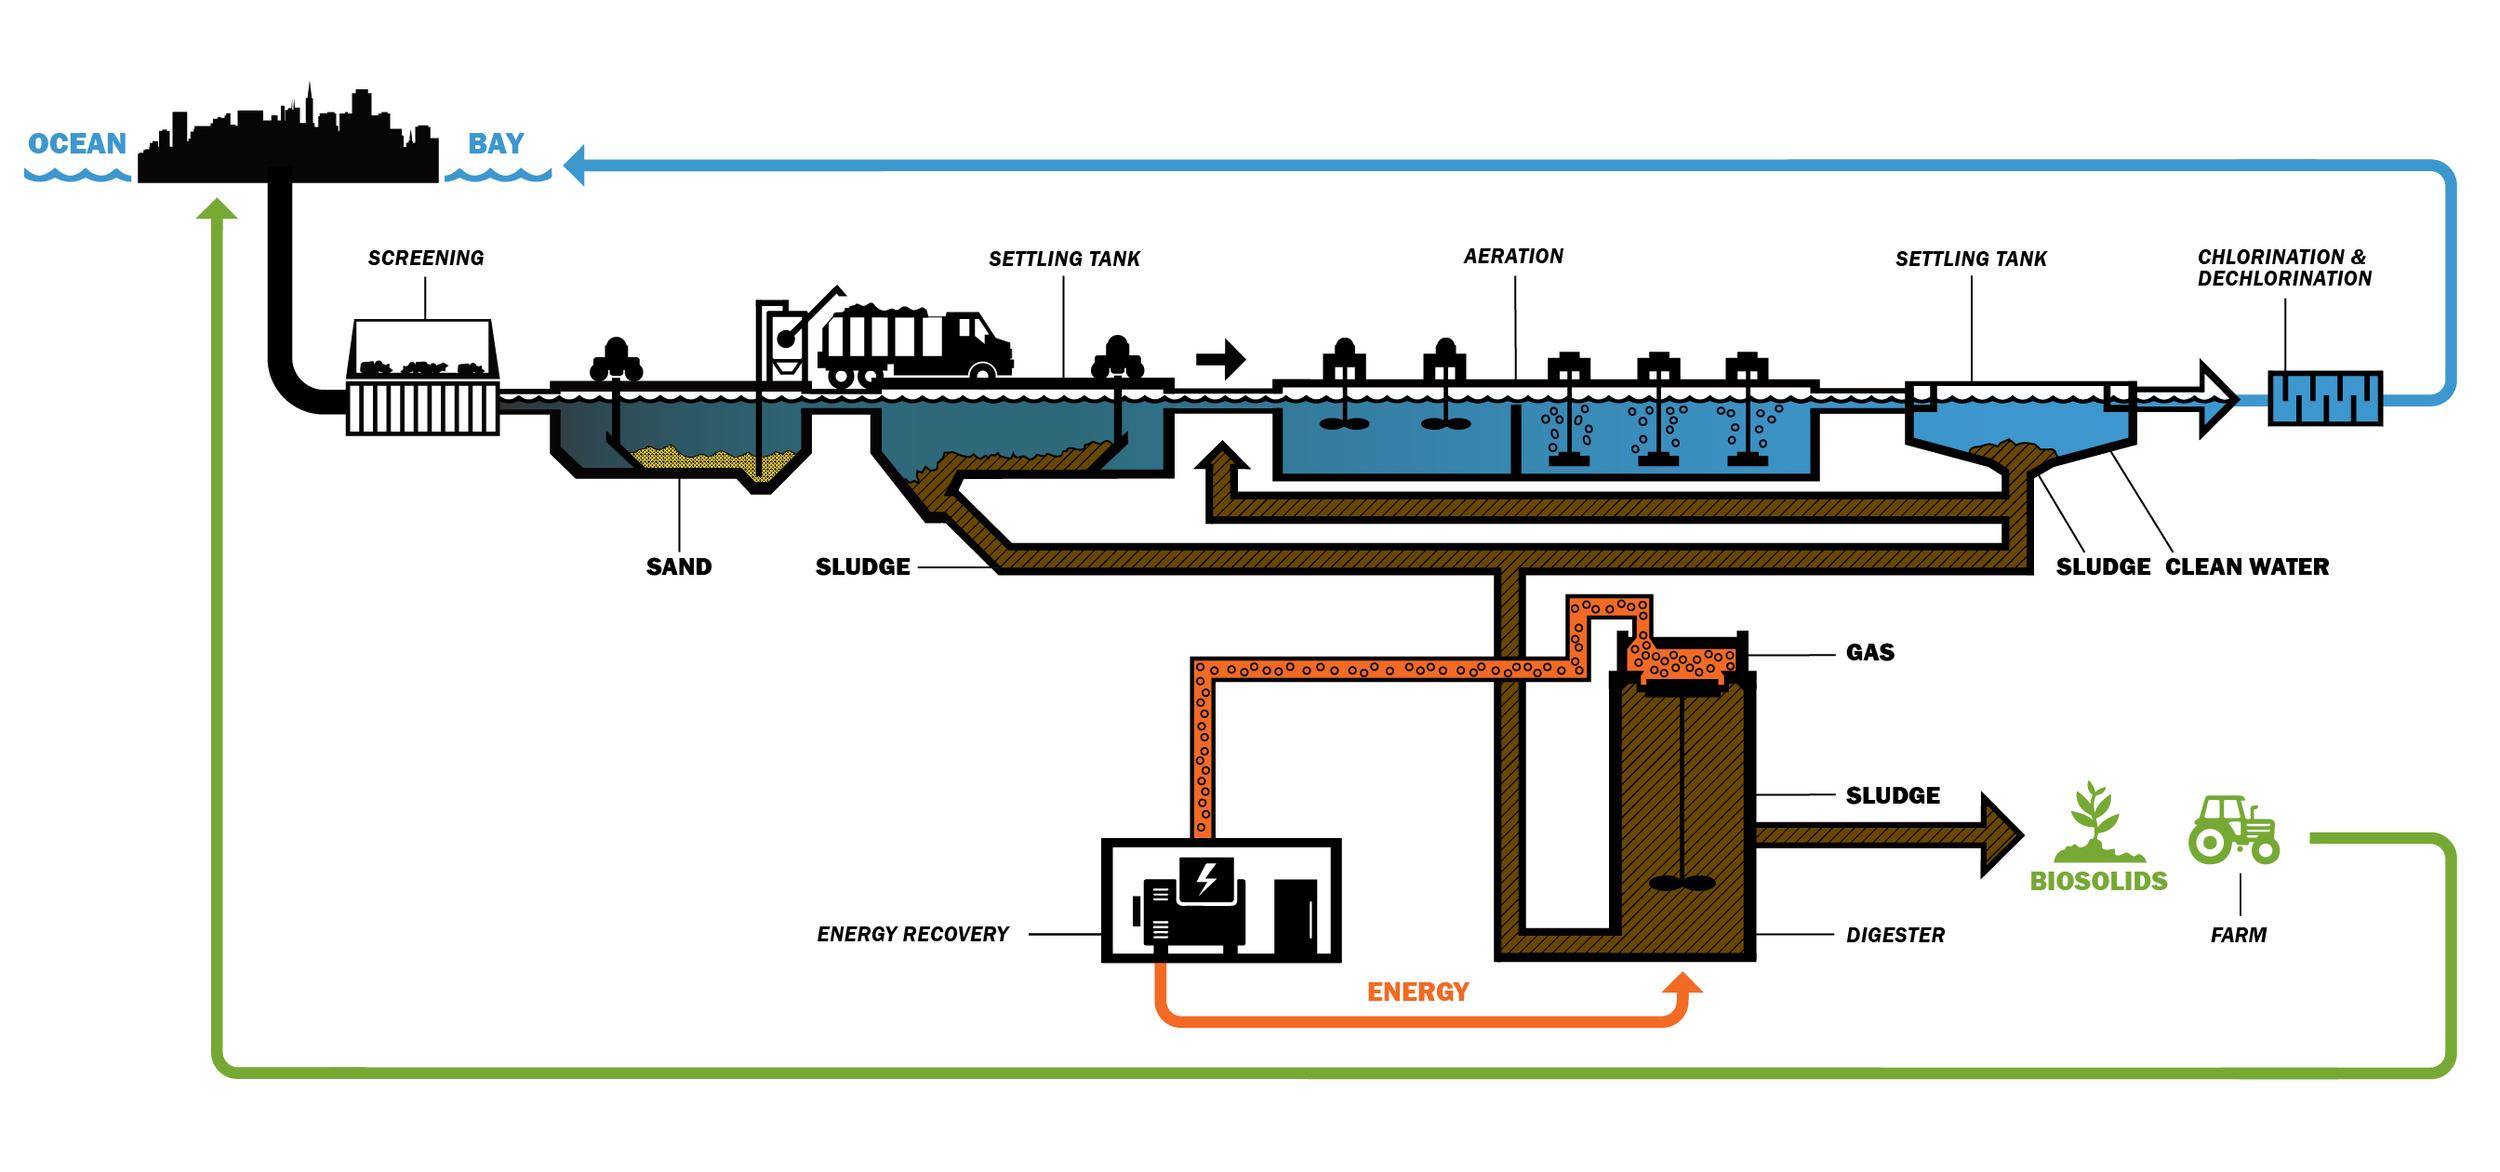 Inkedesign-sfpuc-aecom-SewerPlant_diagram_v7_CO.BW-072717.png